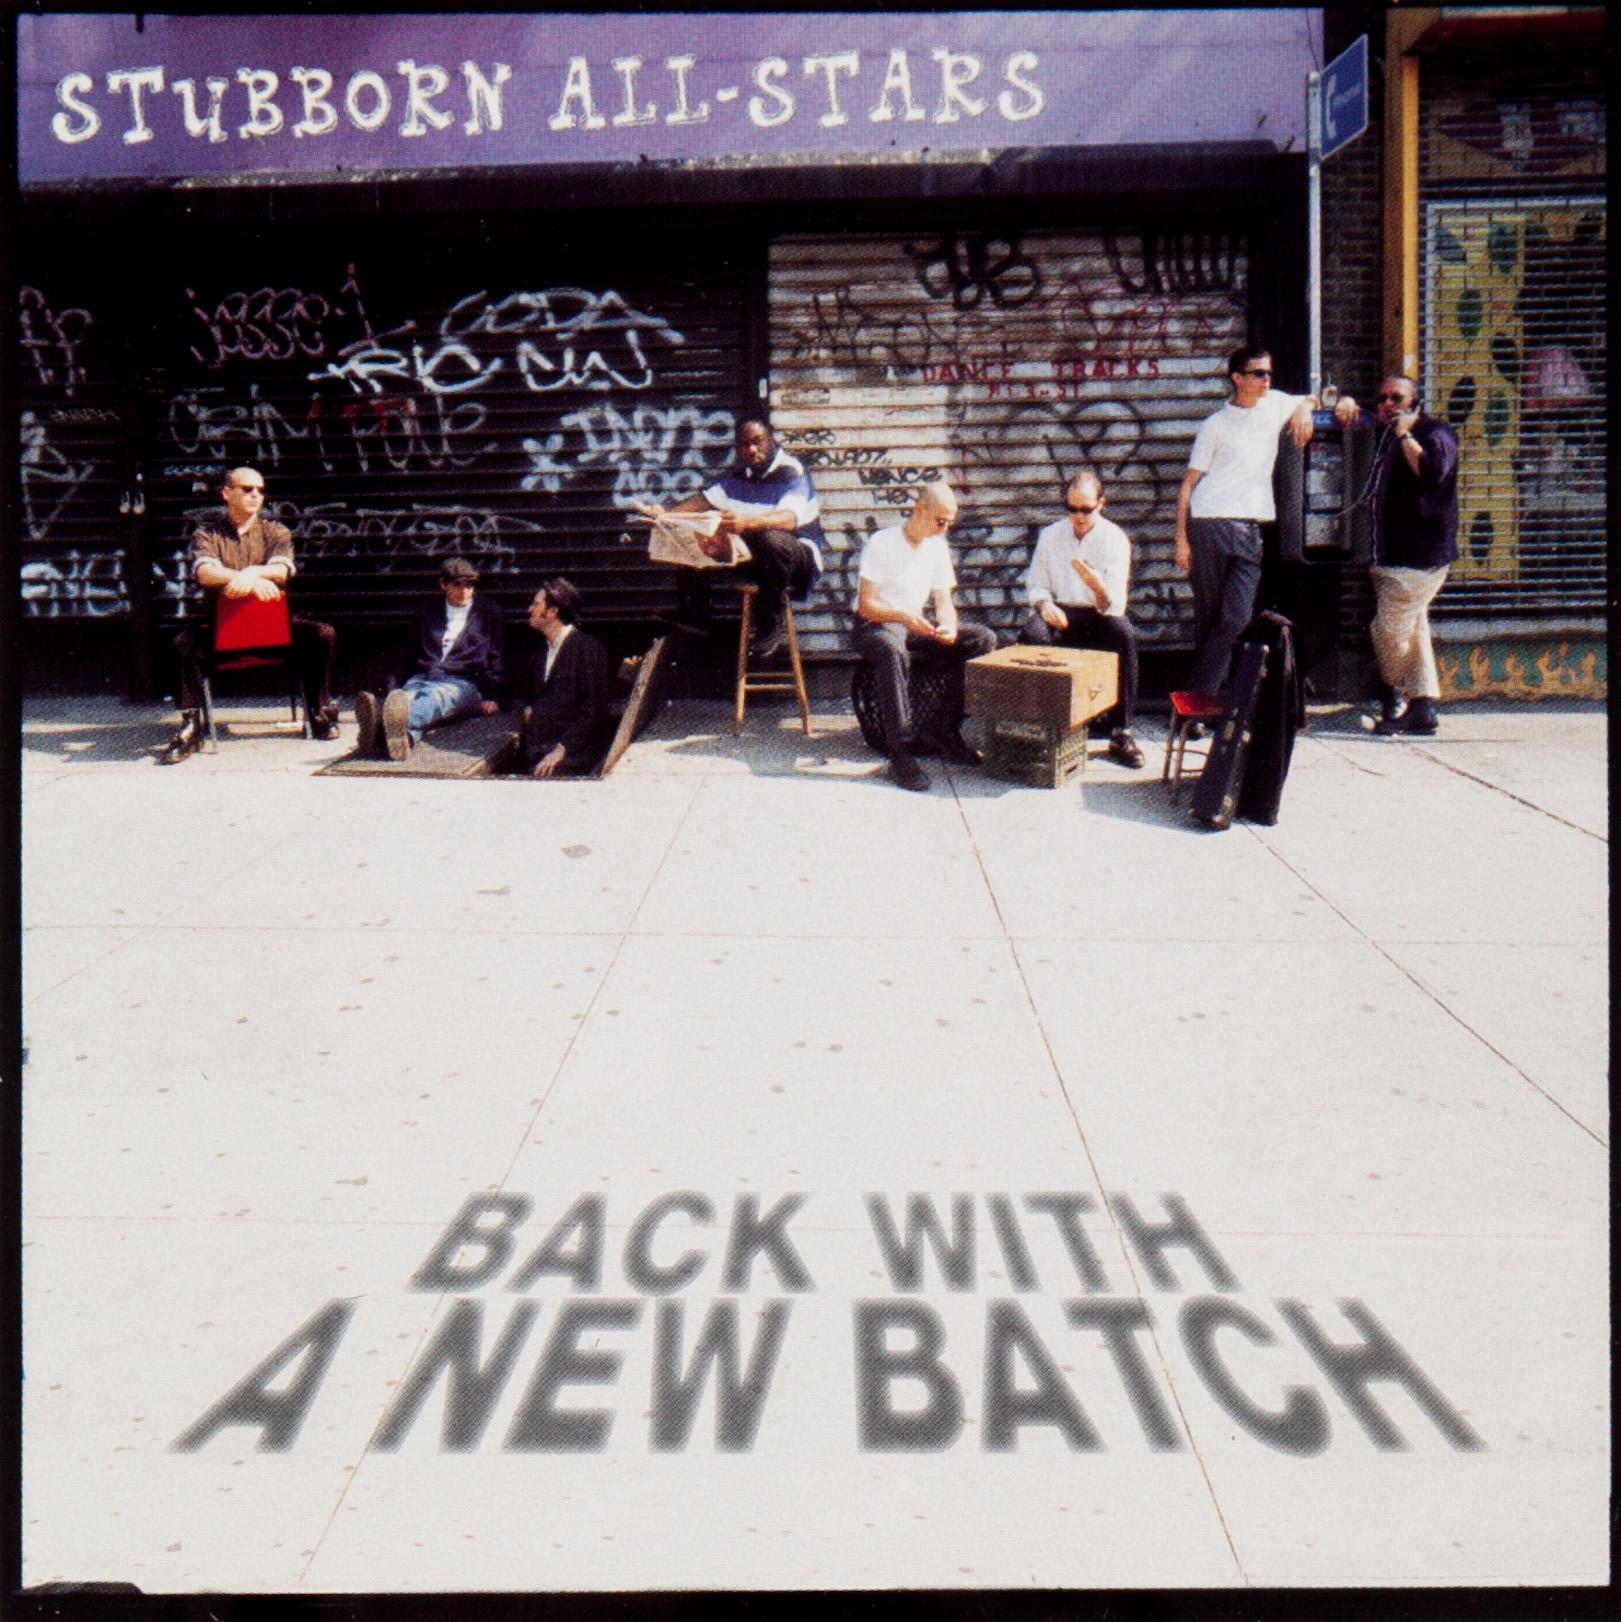 2015-0330-BJPapas_AlbumCovers_StubbornAllstars-BackWithTheNewBatch_Front+Back0161.jpg